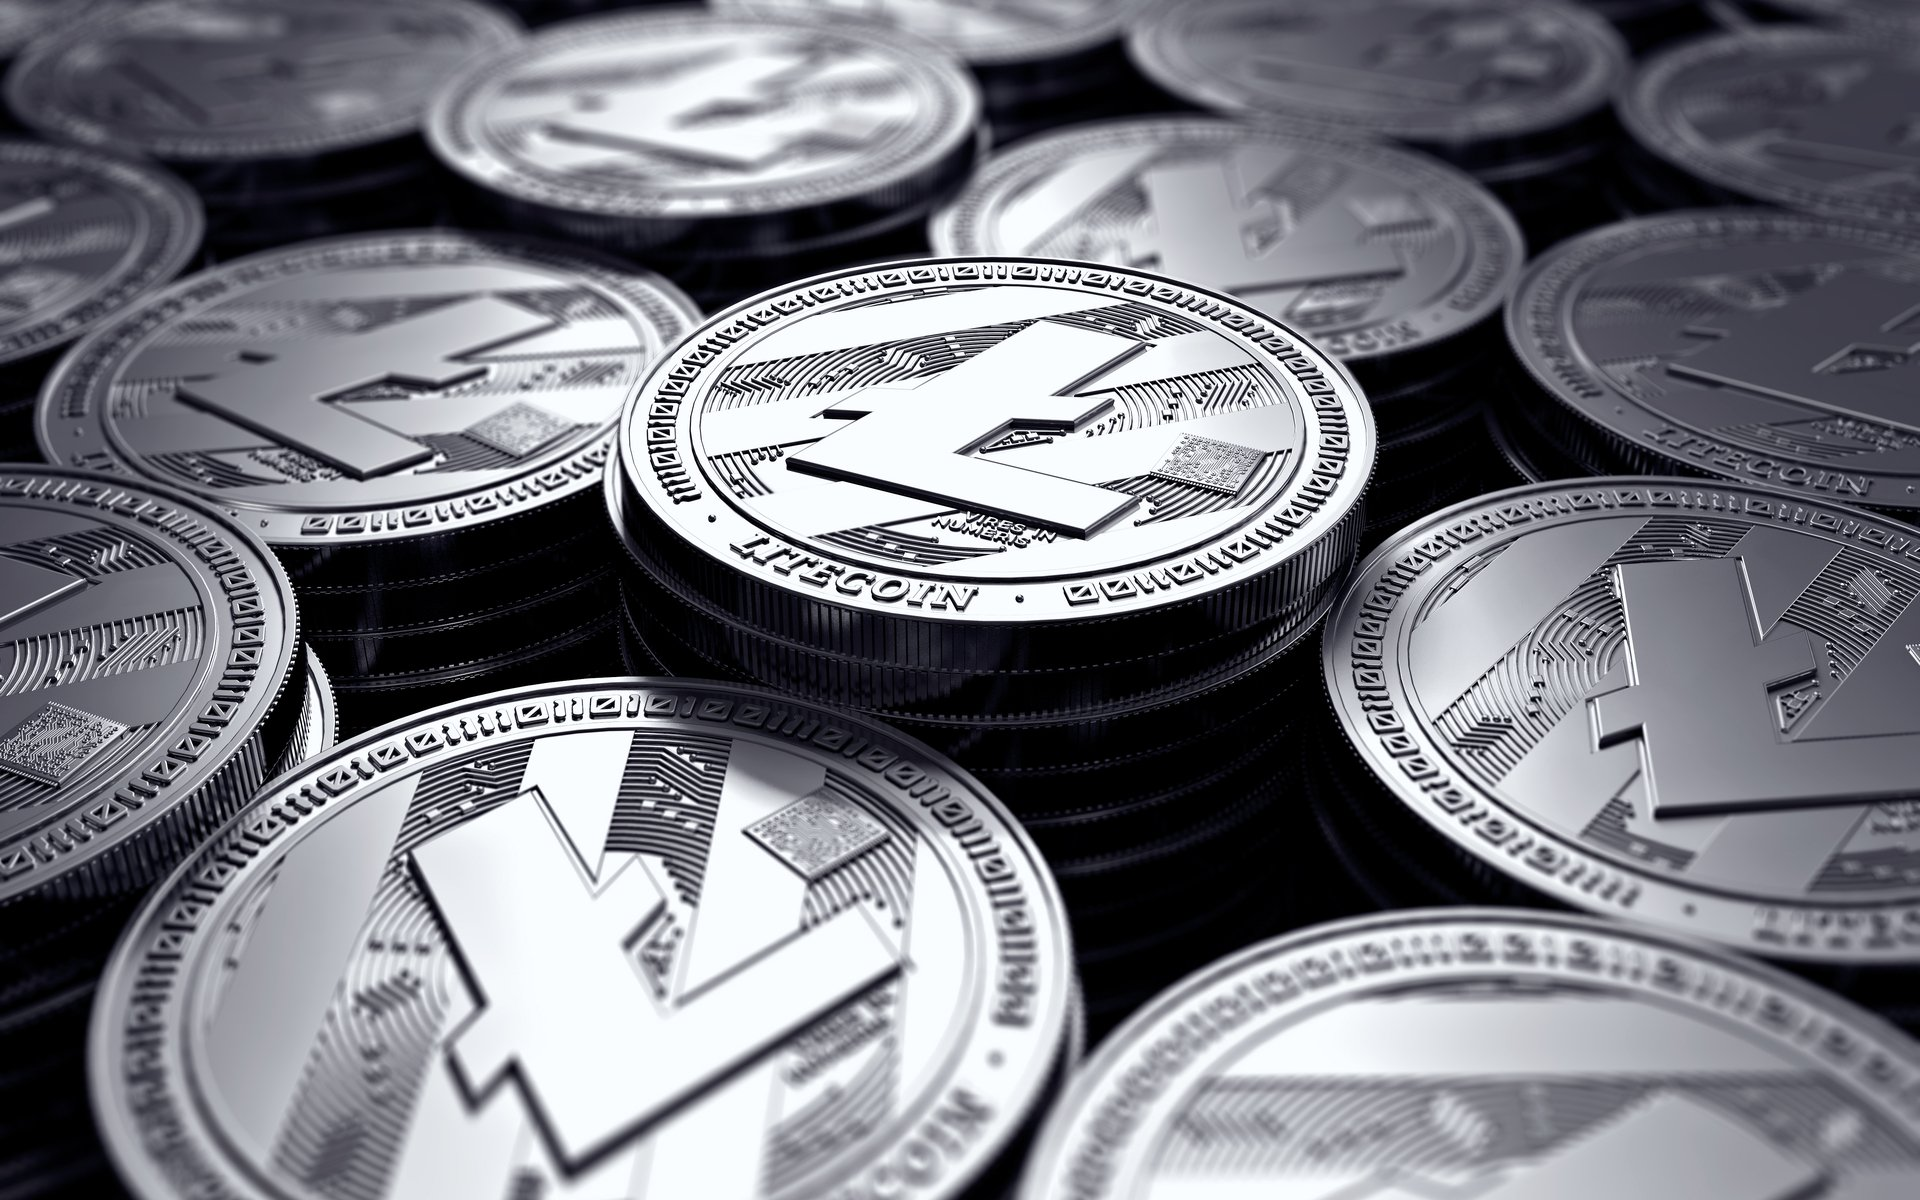 Litecoin Foundation to Sponsor UFC Title Fight in Bid to Increase Crypto Adoption